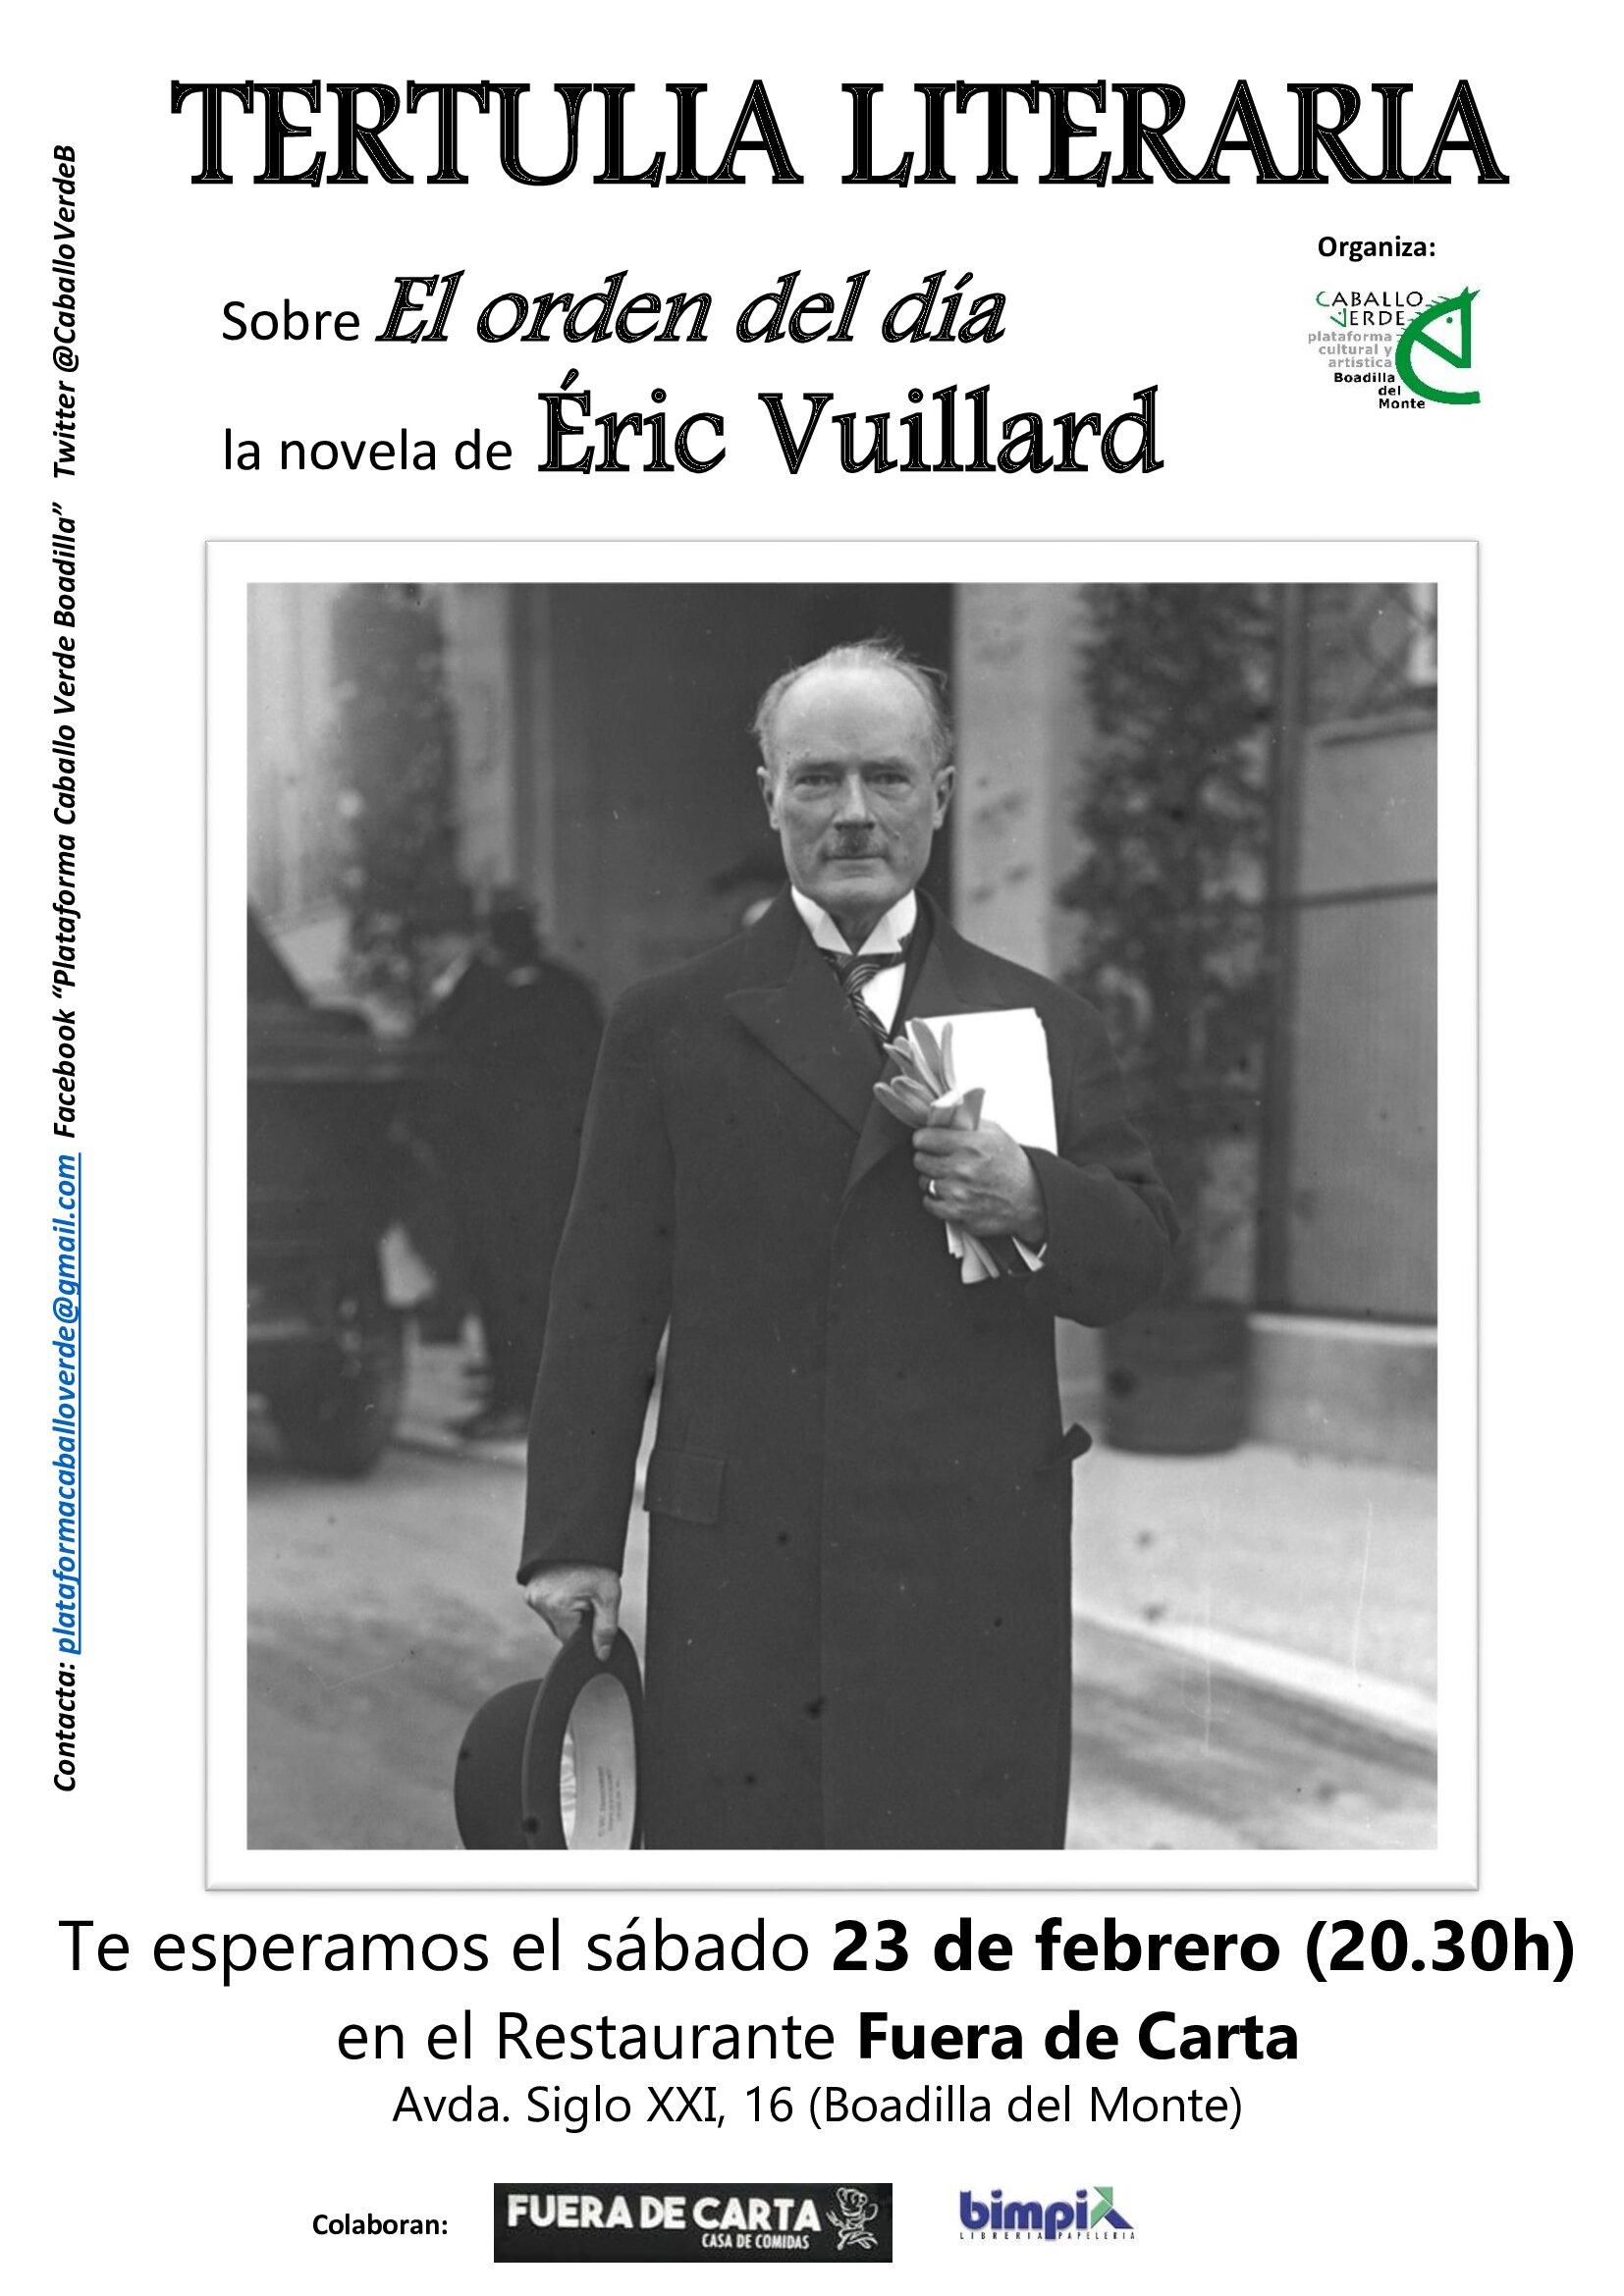 Tertulia literaria Caballo Verde Éric Vuillard